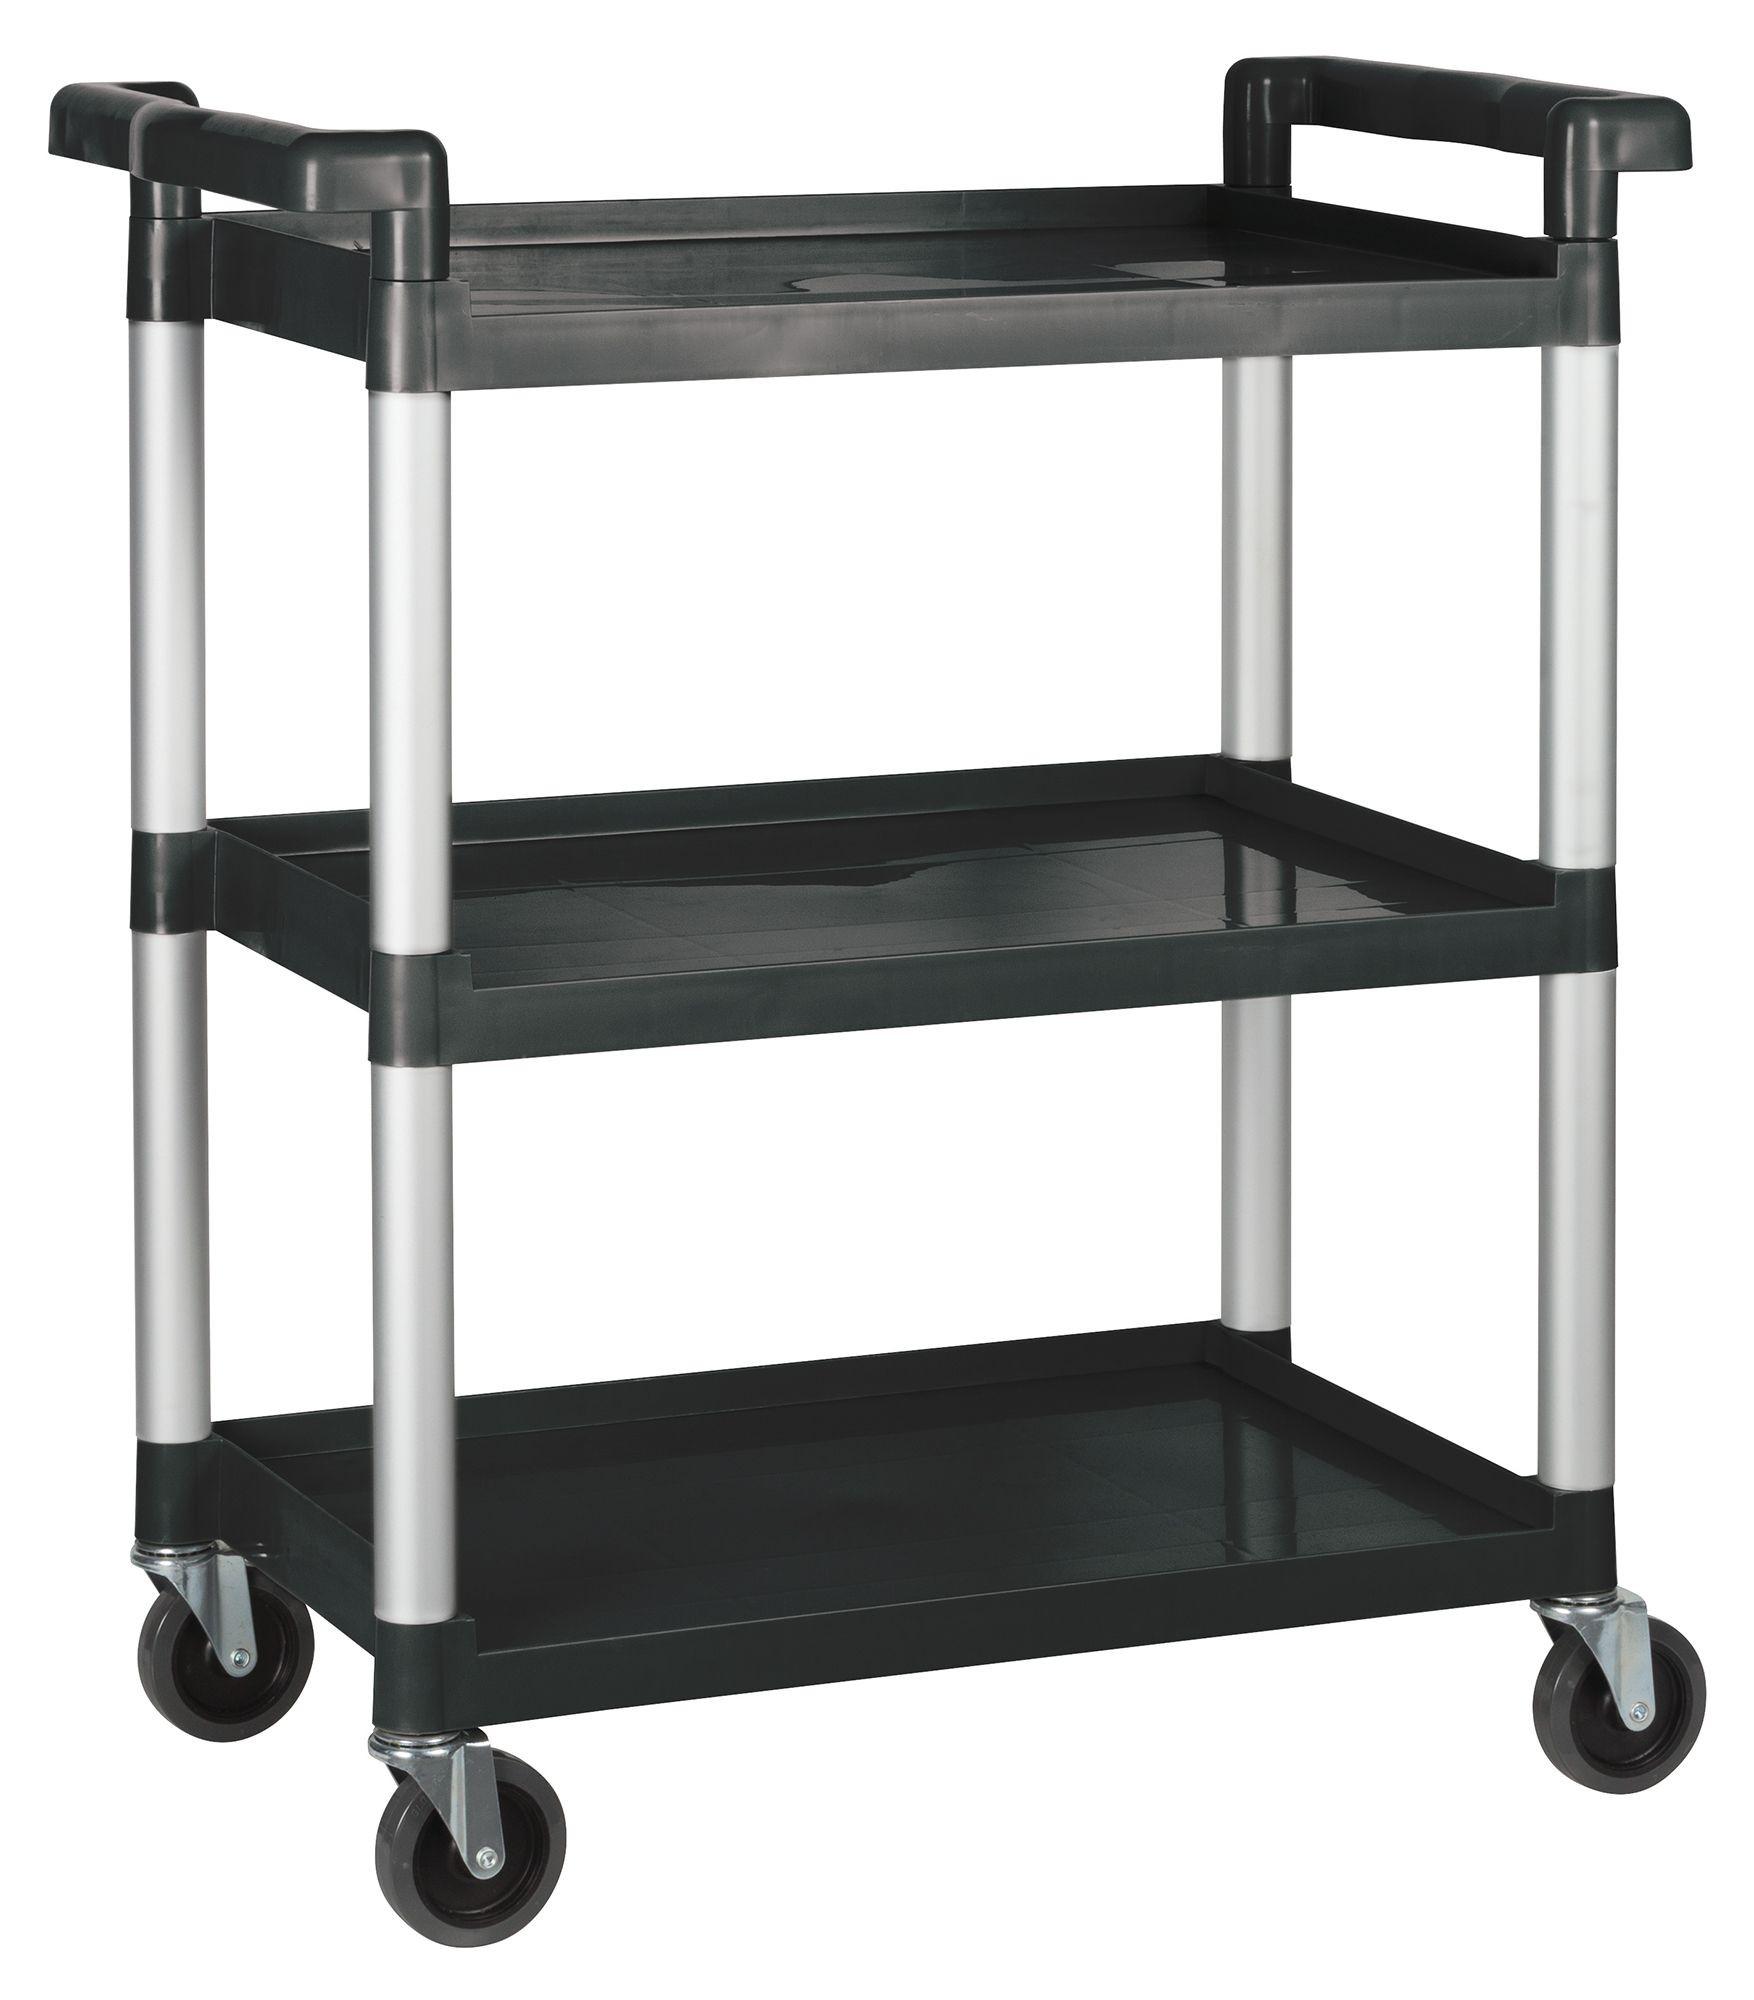 "Winco UC-35K 3-Tier Black Plastic Utility Cart 33-1/4"" x 17"" x 37-1/2"""